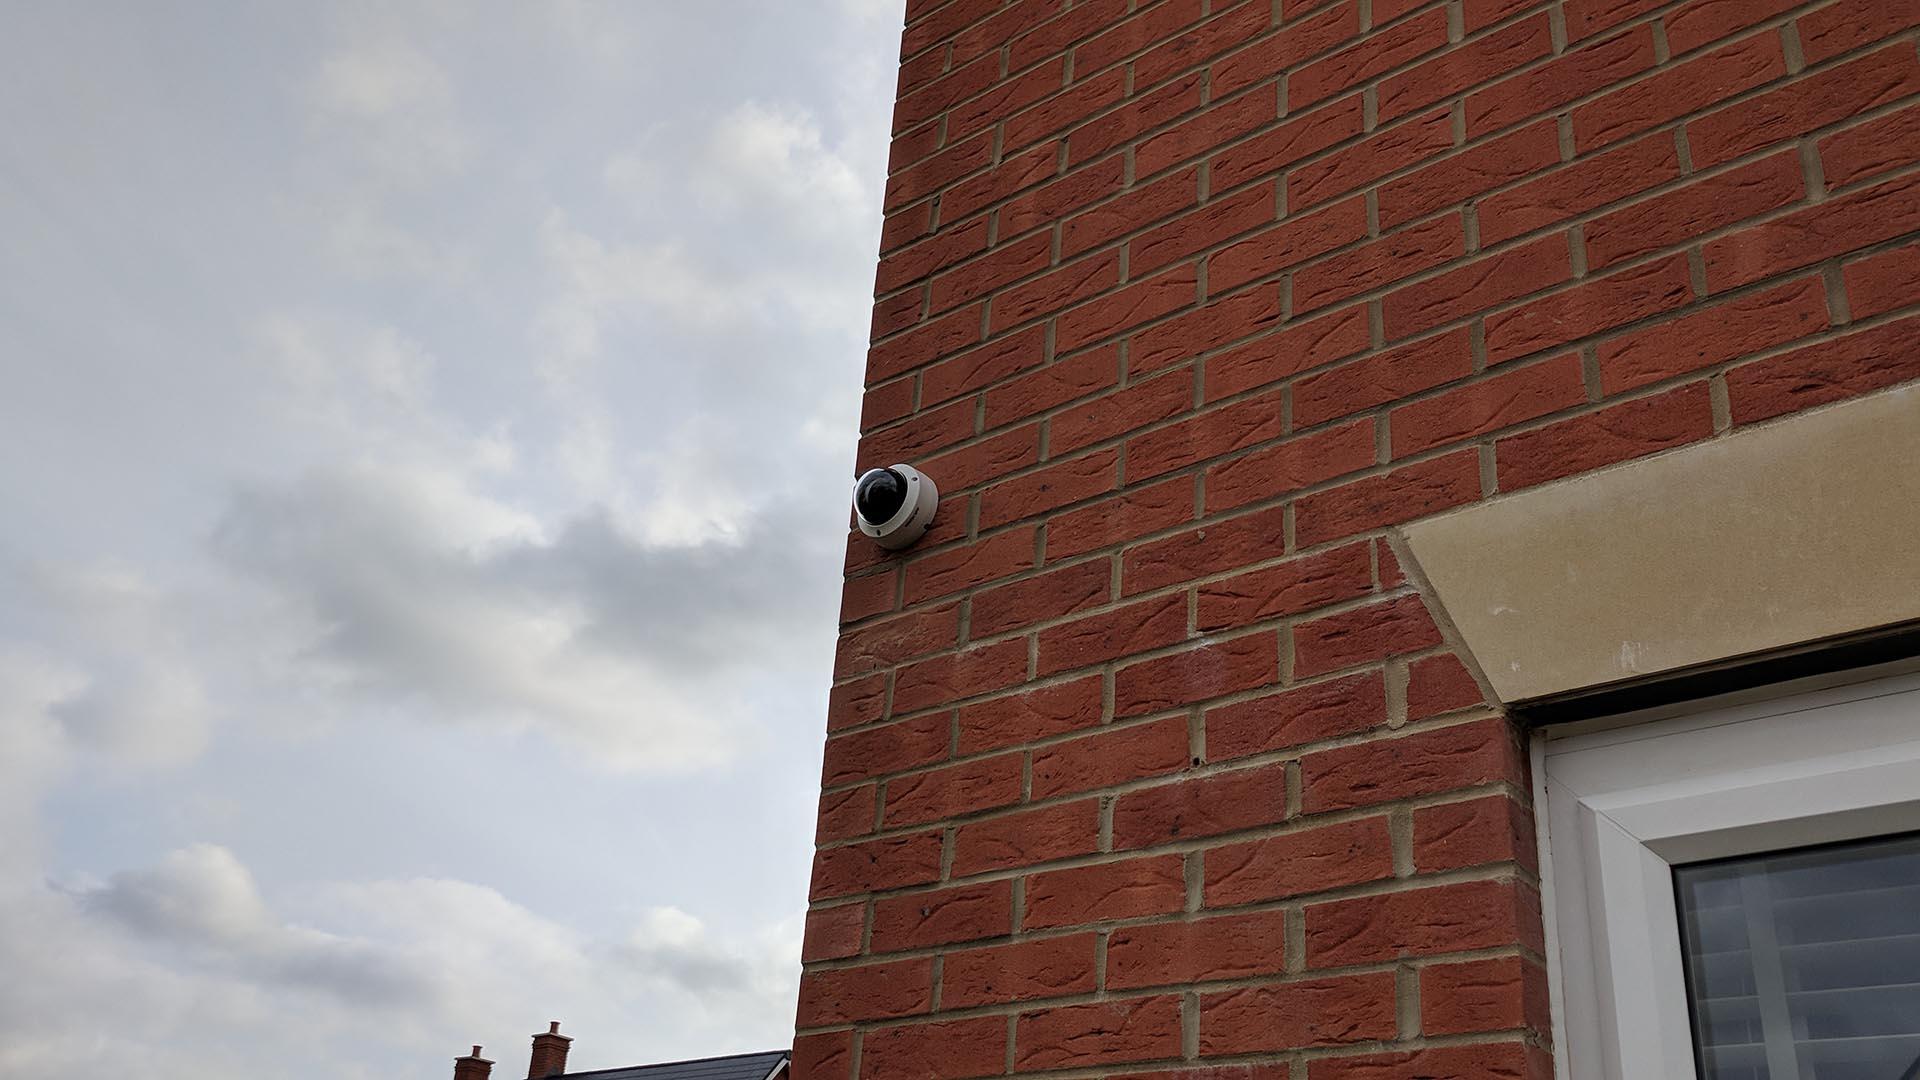 CCTV Installation in Dunton Fields